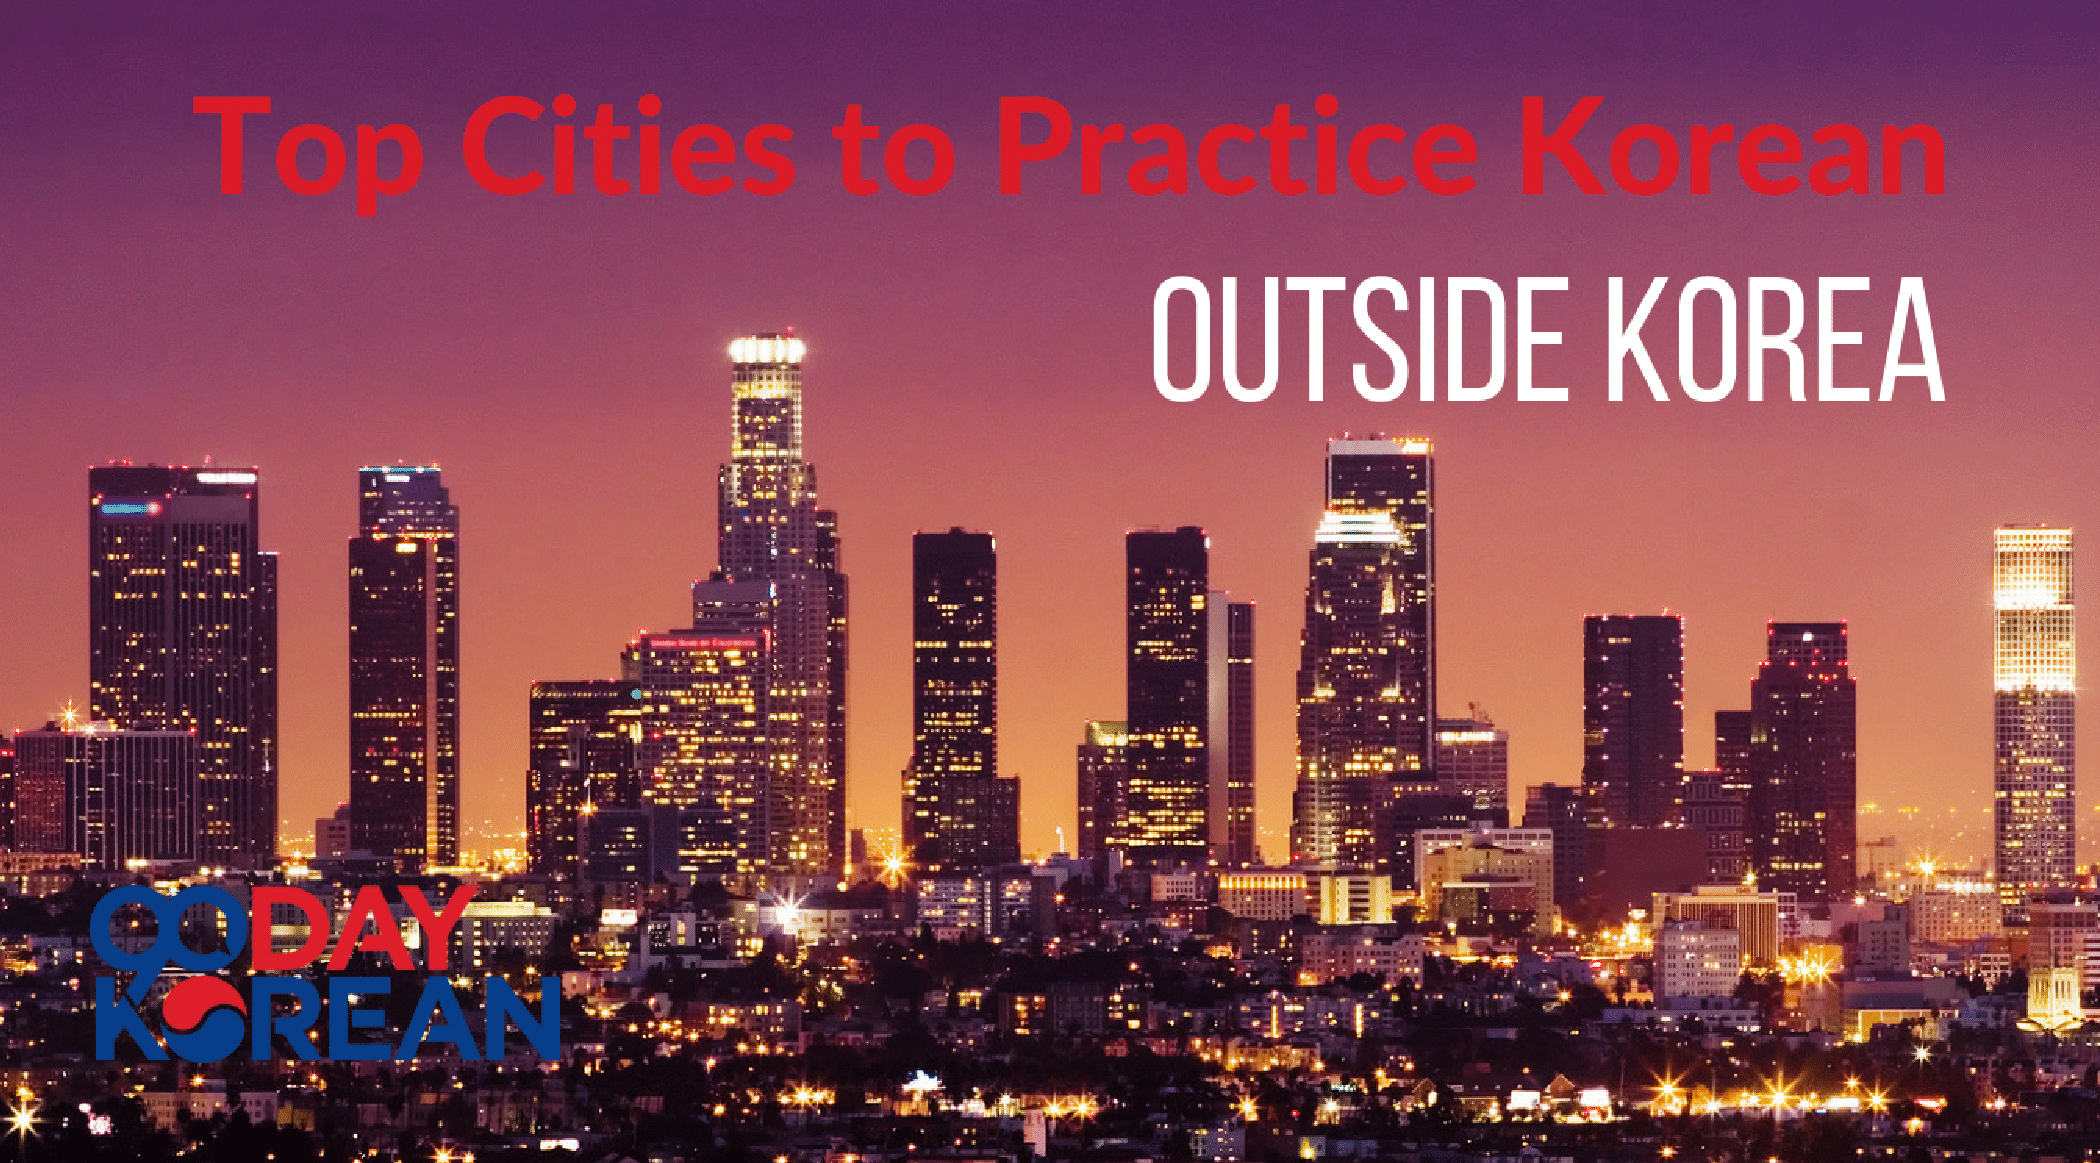 Top Cities to Practice Korean Outside Korea